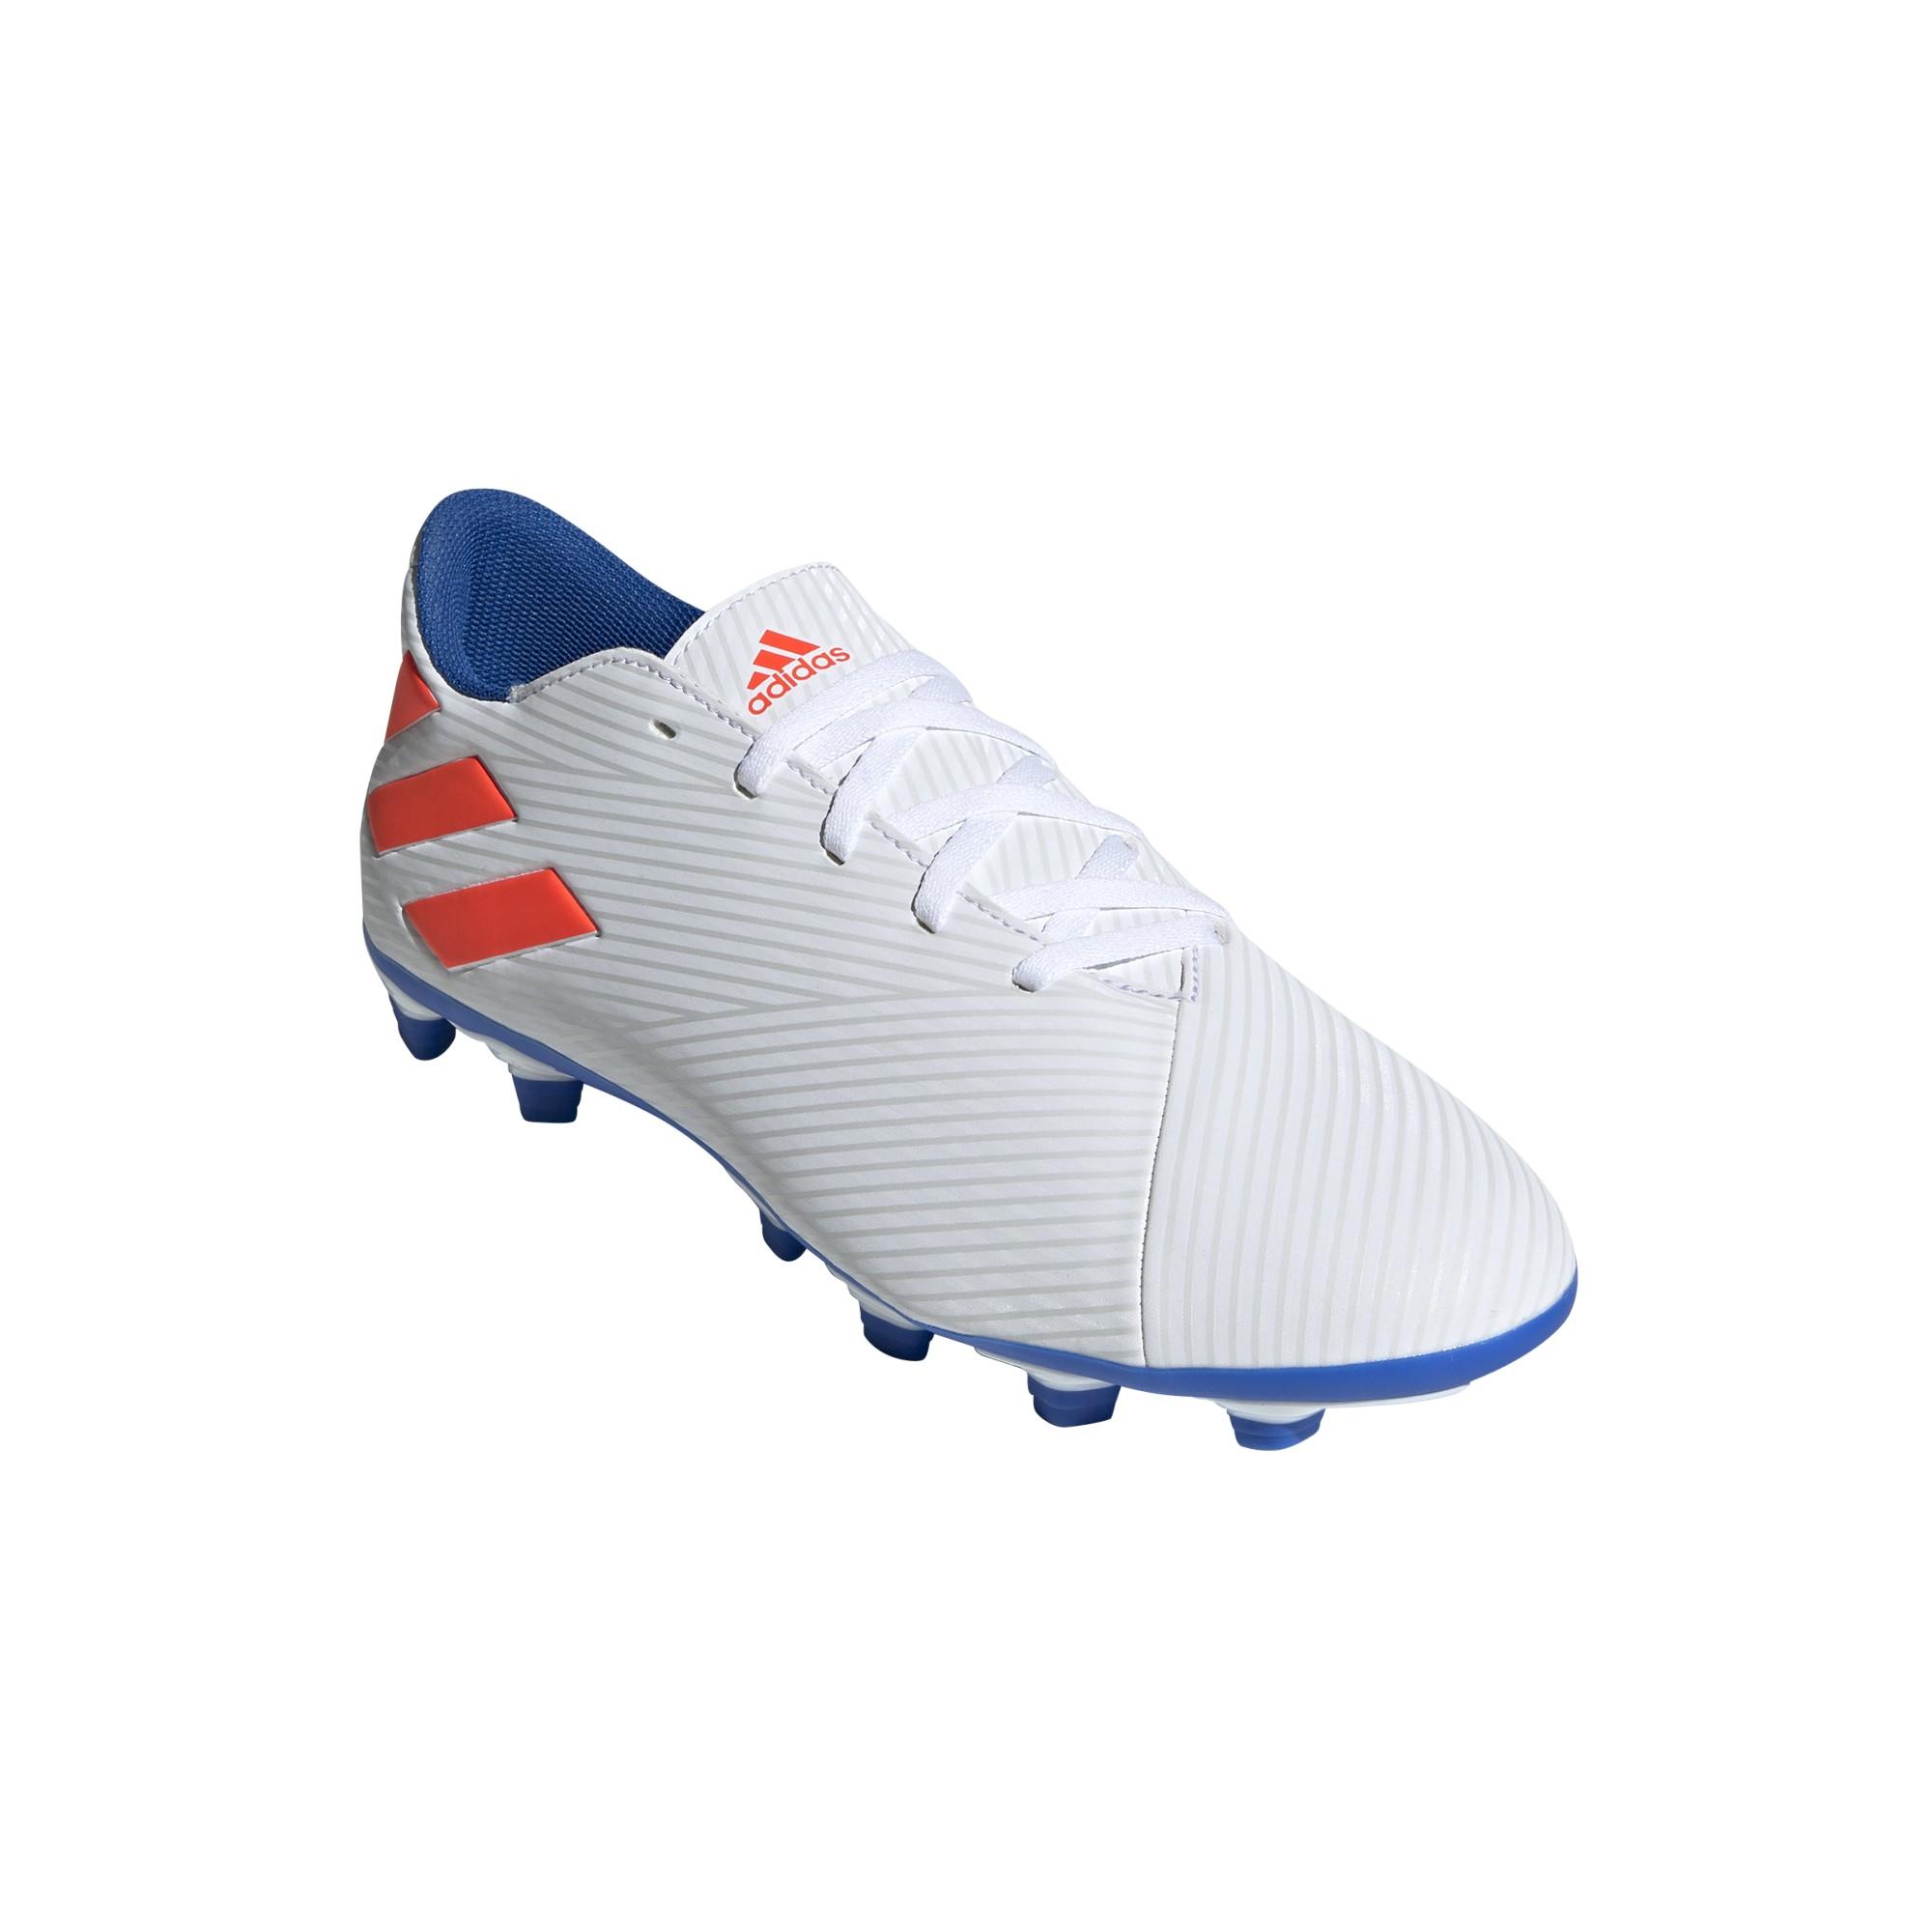 Bota Futbol adidas Nemeziz Messi 19.4 F34401 Deportes